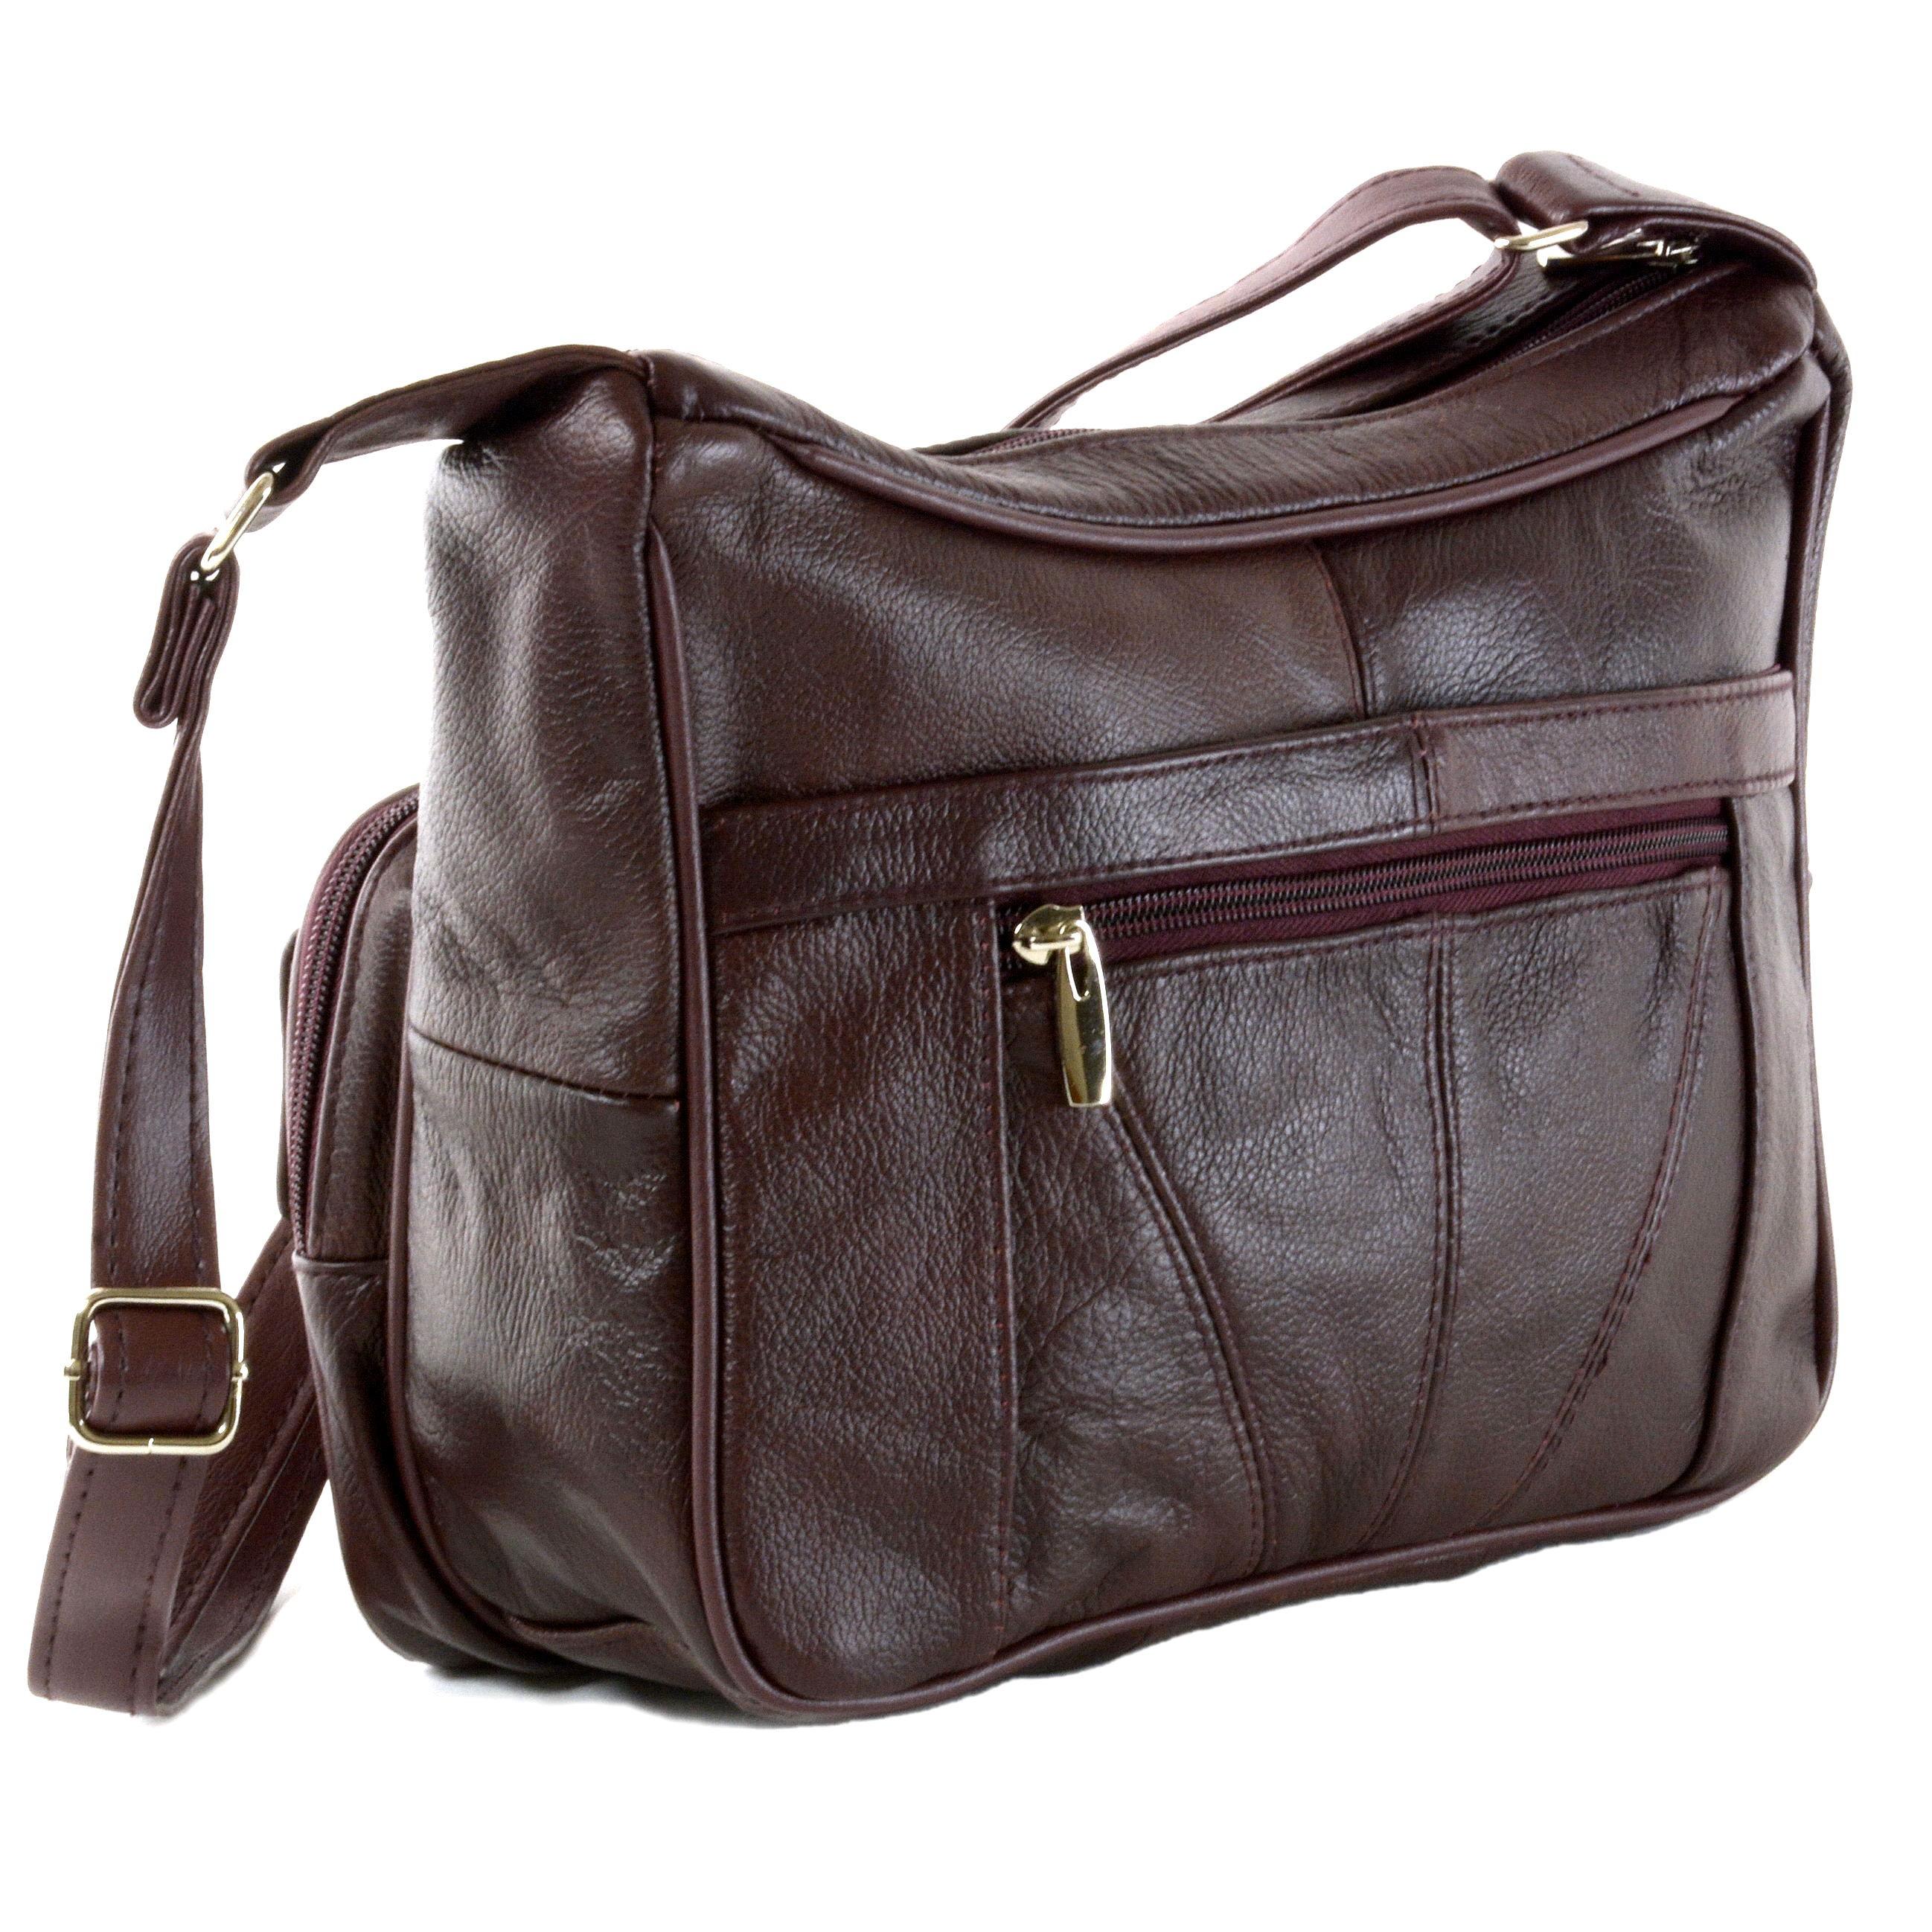 4419f59c78 Women s Leather Organizer Purse Shoulder Bag Multiple Pockets Cross ...